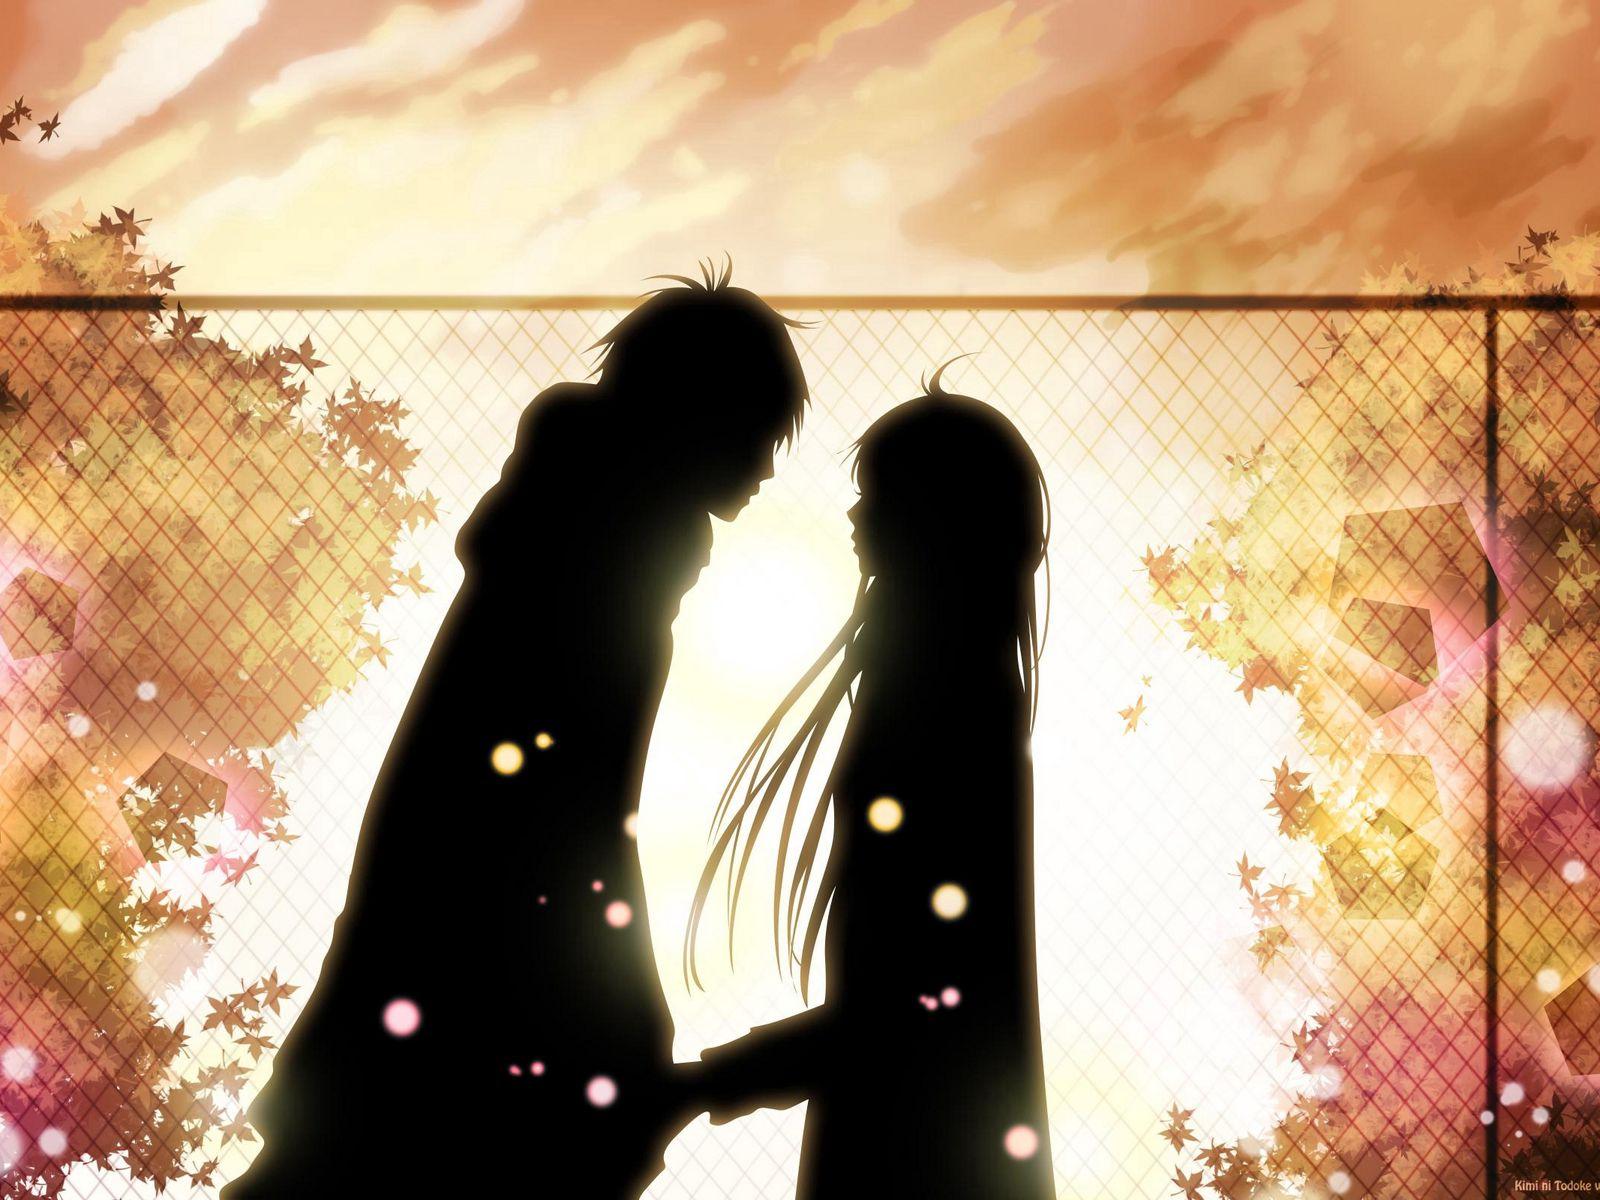 1600x1200 Wallpaper kimi ni todoke, girl, boy, love, feelings, meet, date, fall, leaves